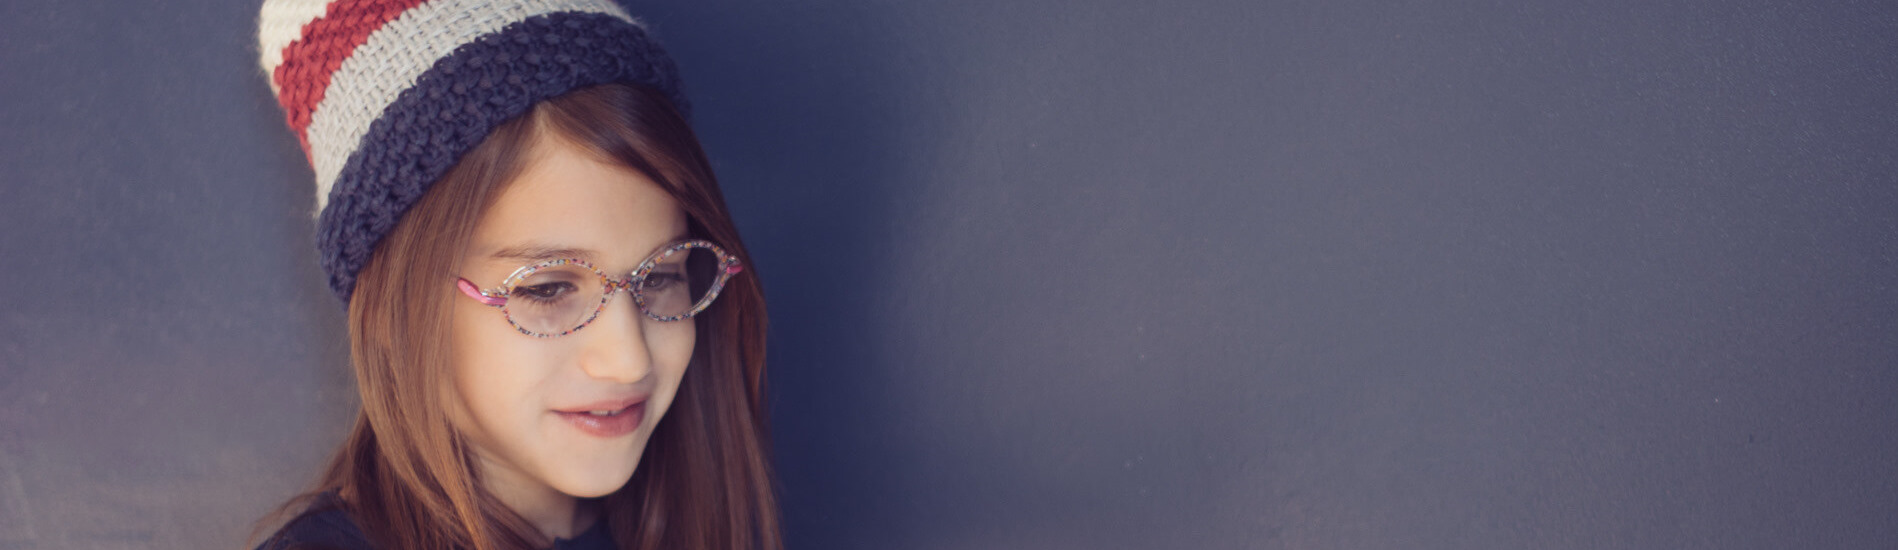 lunette fille